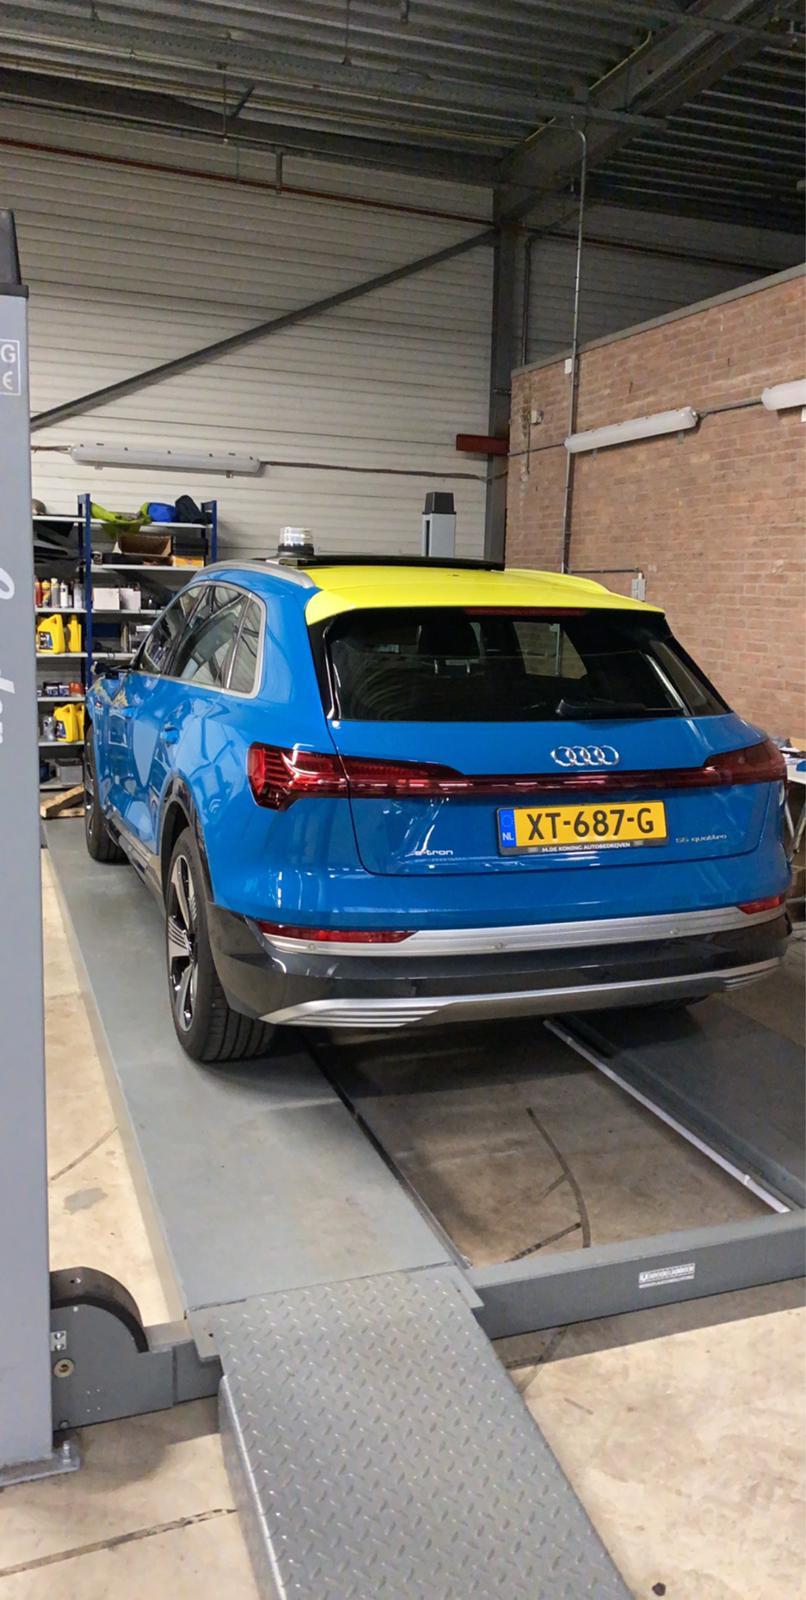 Audi wrap naar ambulance